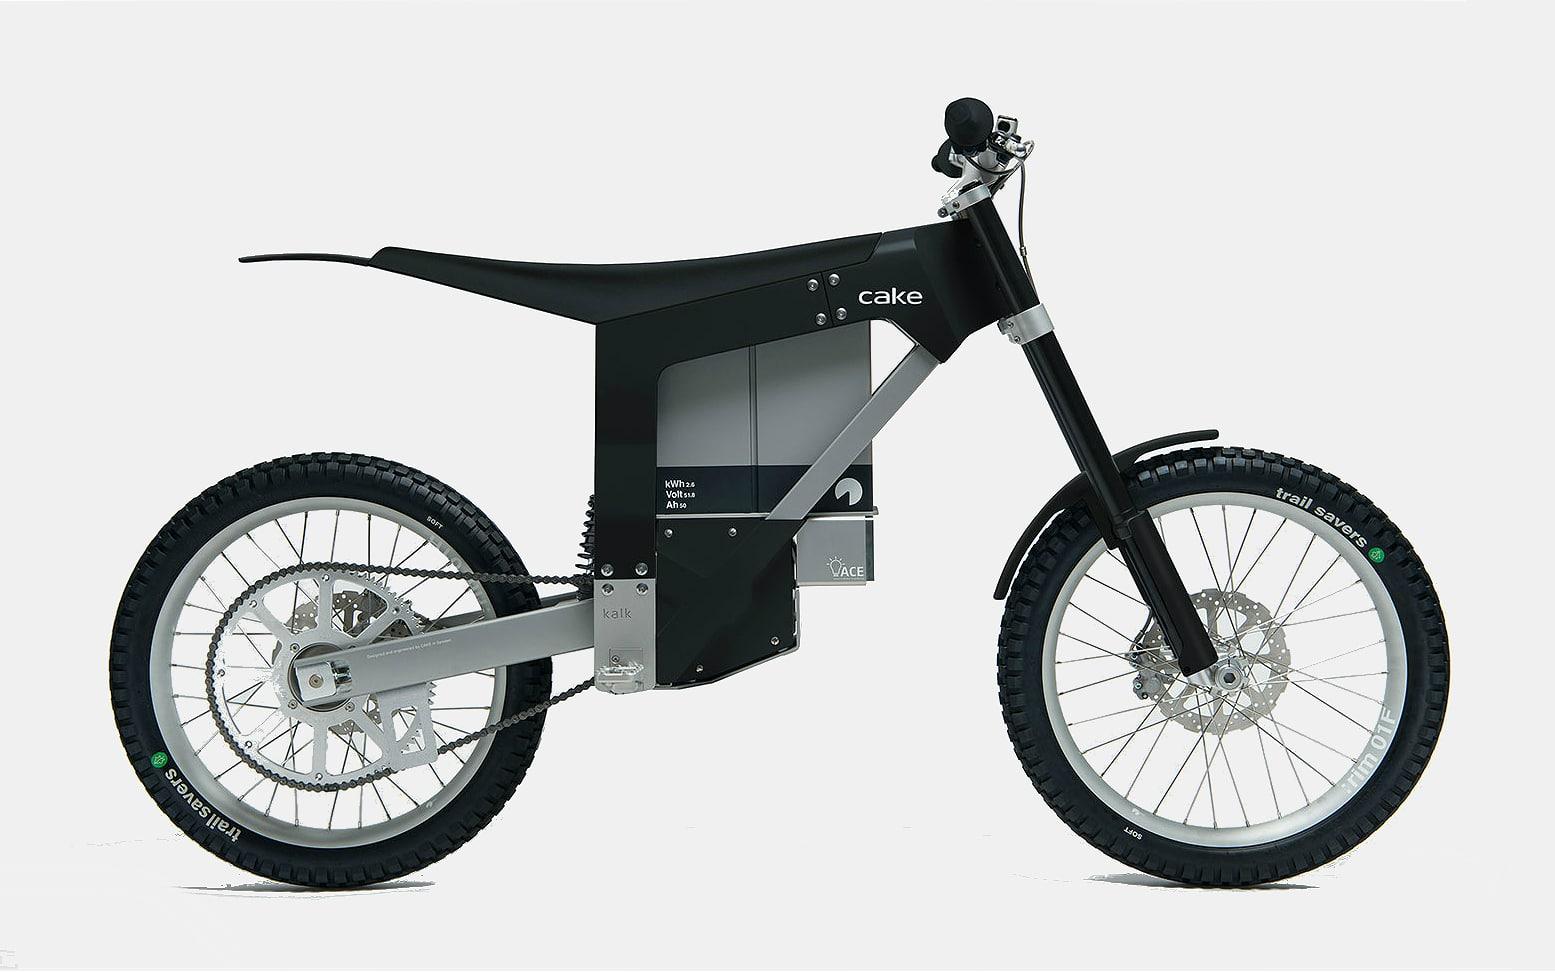 Cake Kalk Ink Electric Motorcycle